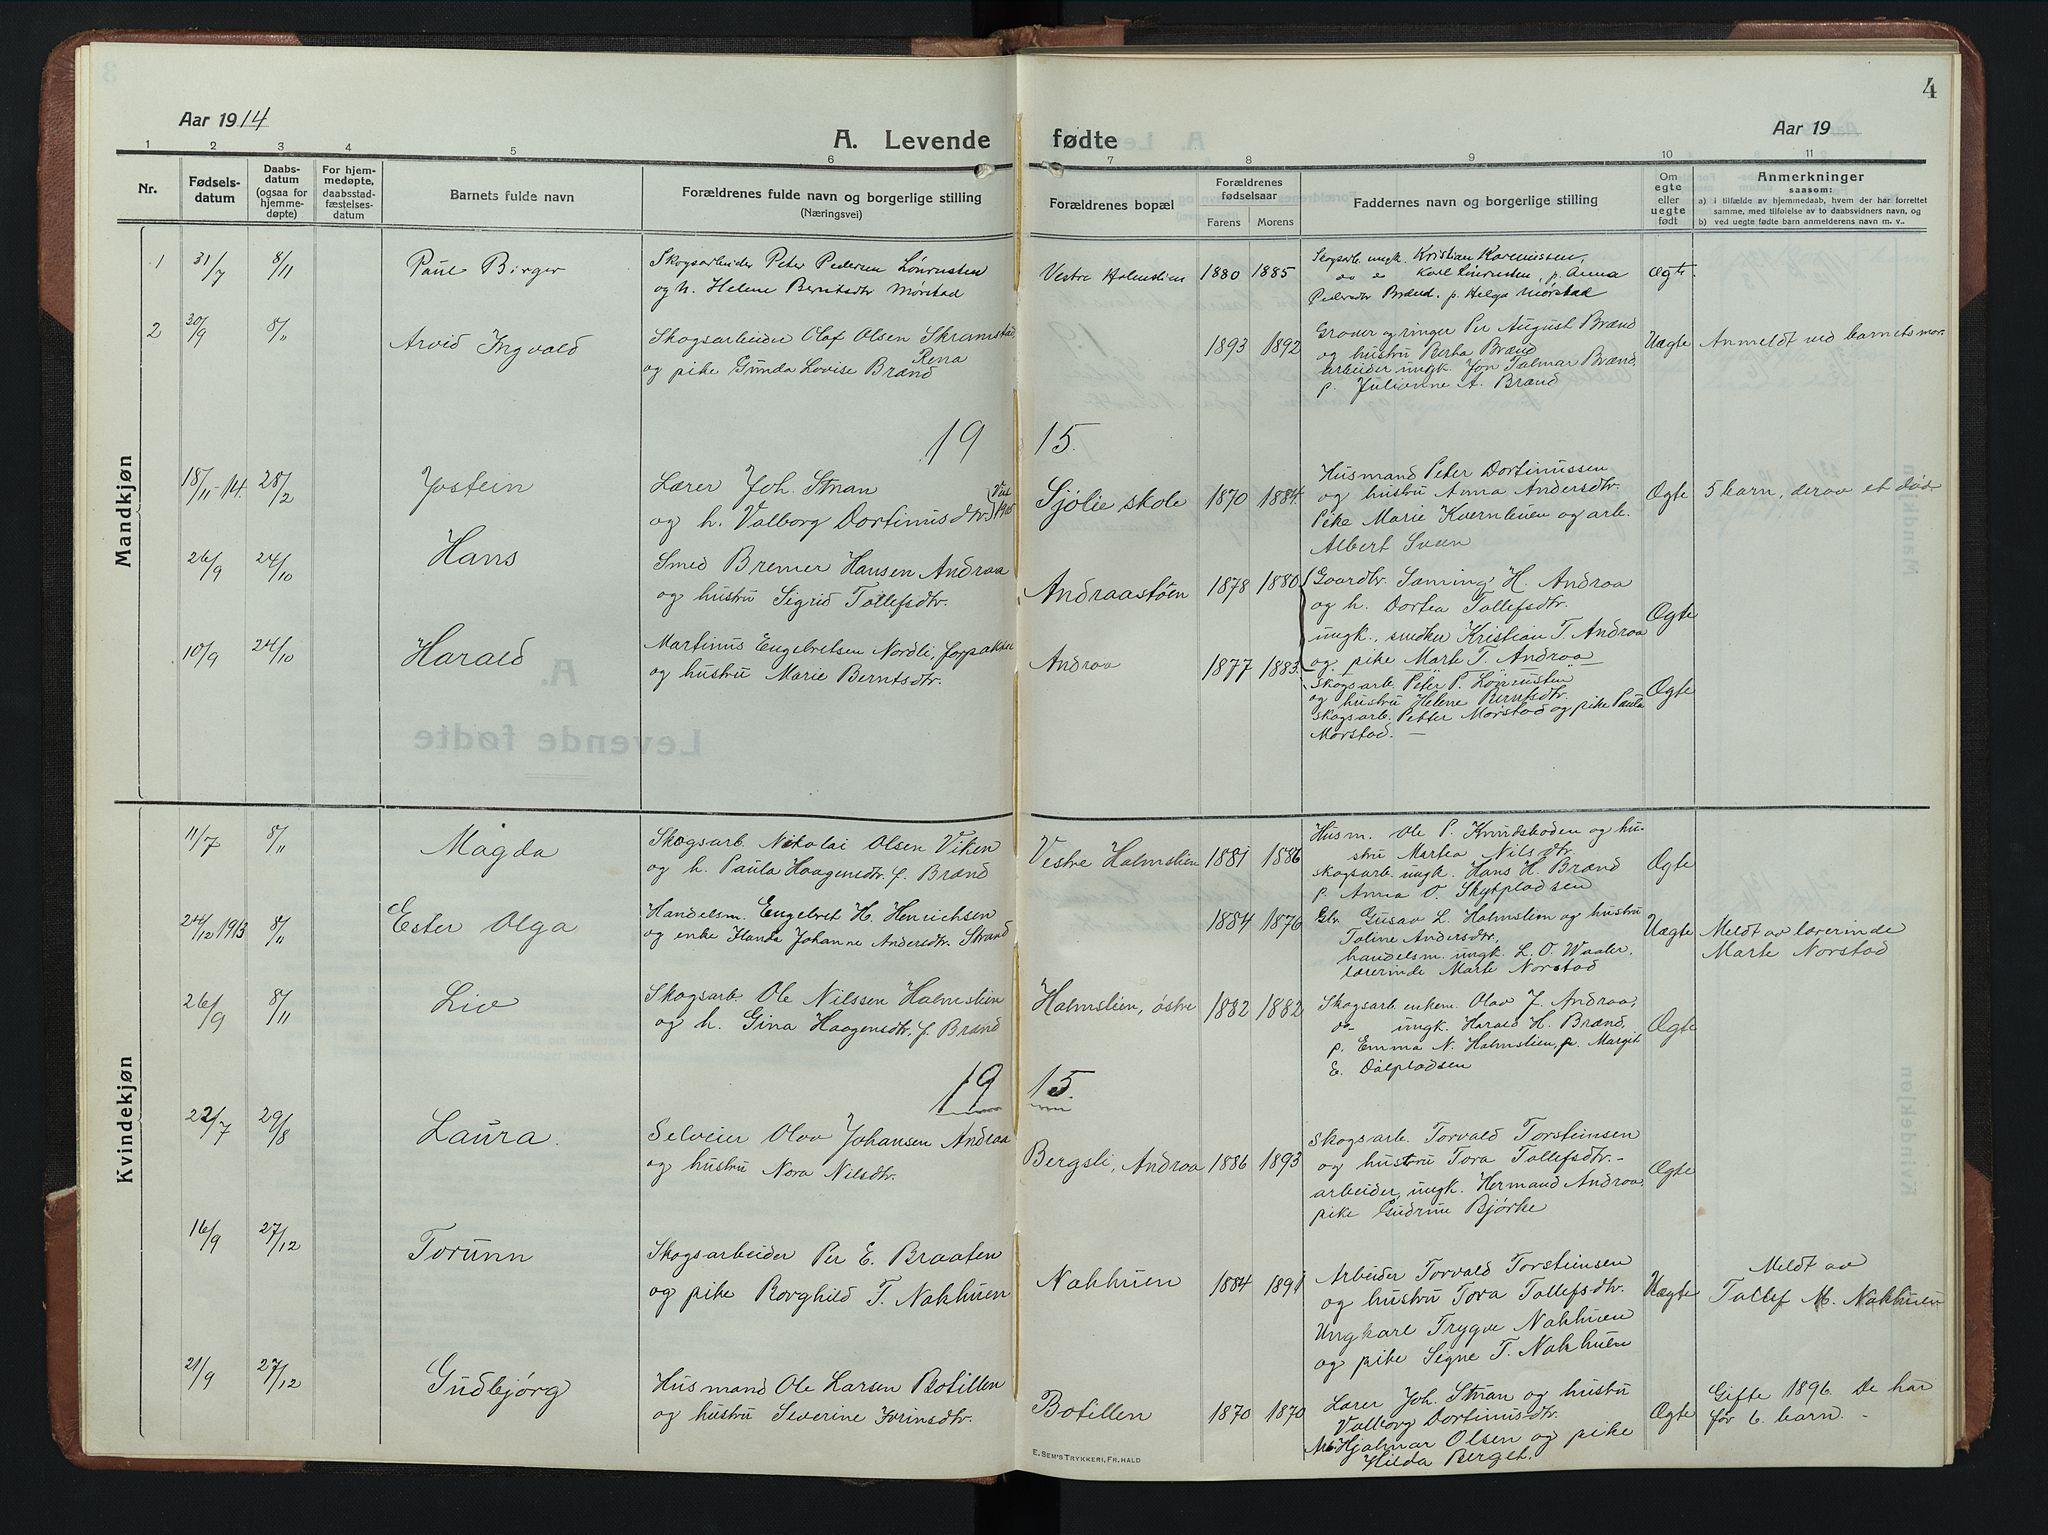 SAH, Rendalen prestekontor, H/Ha/Hab/L0008: Parish register (copy) no. 8, 1914-1948, p. 4